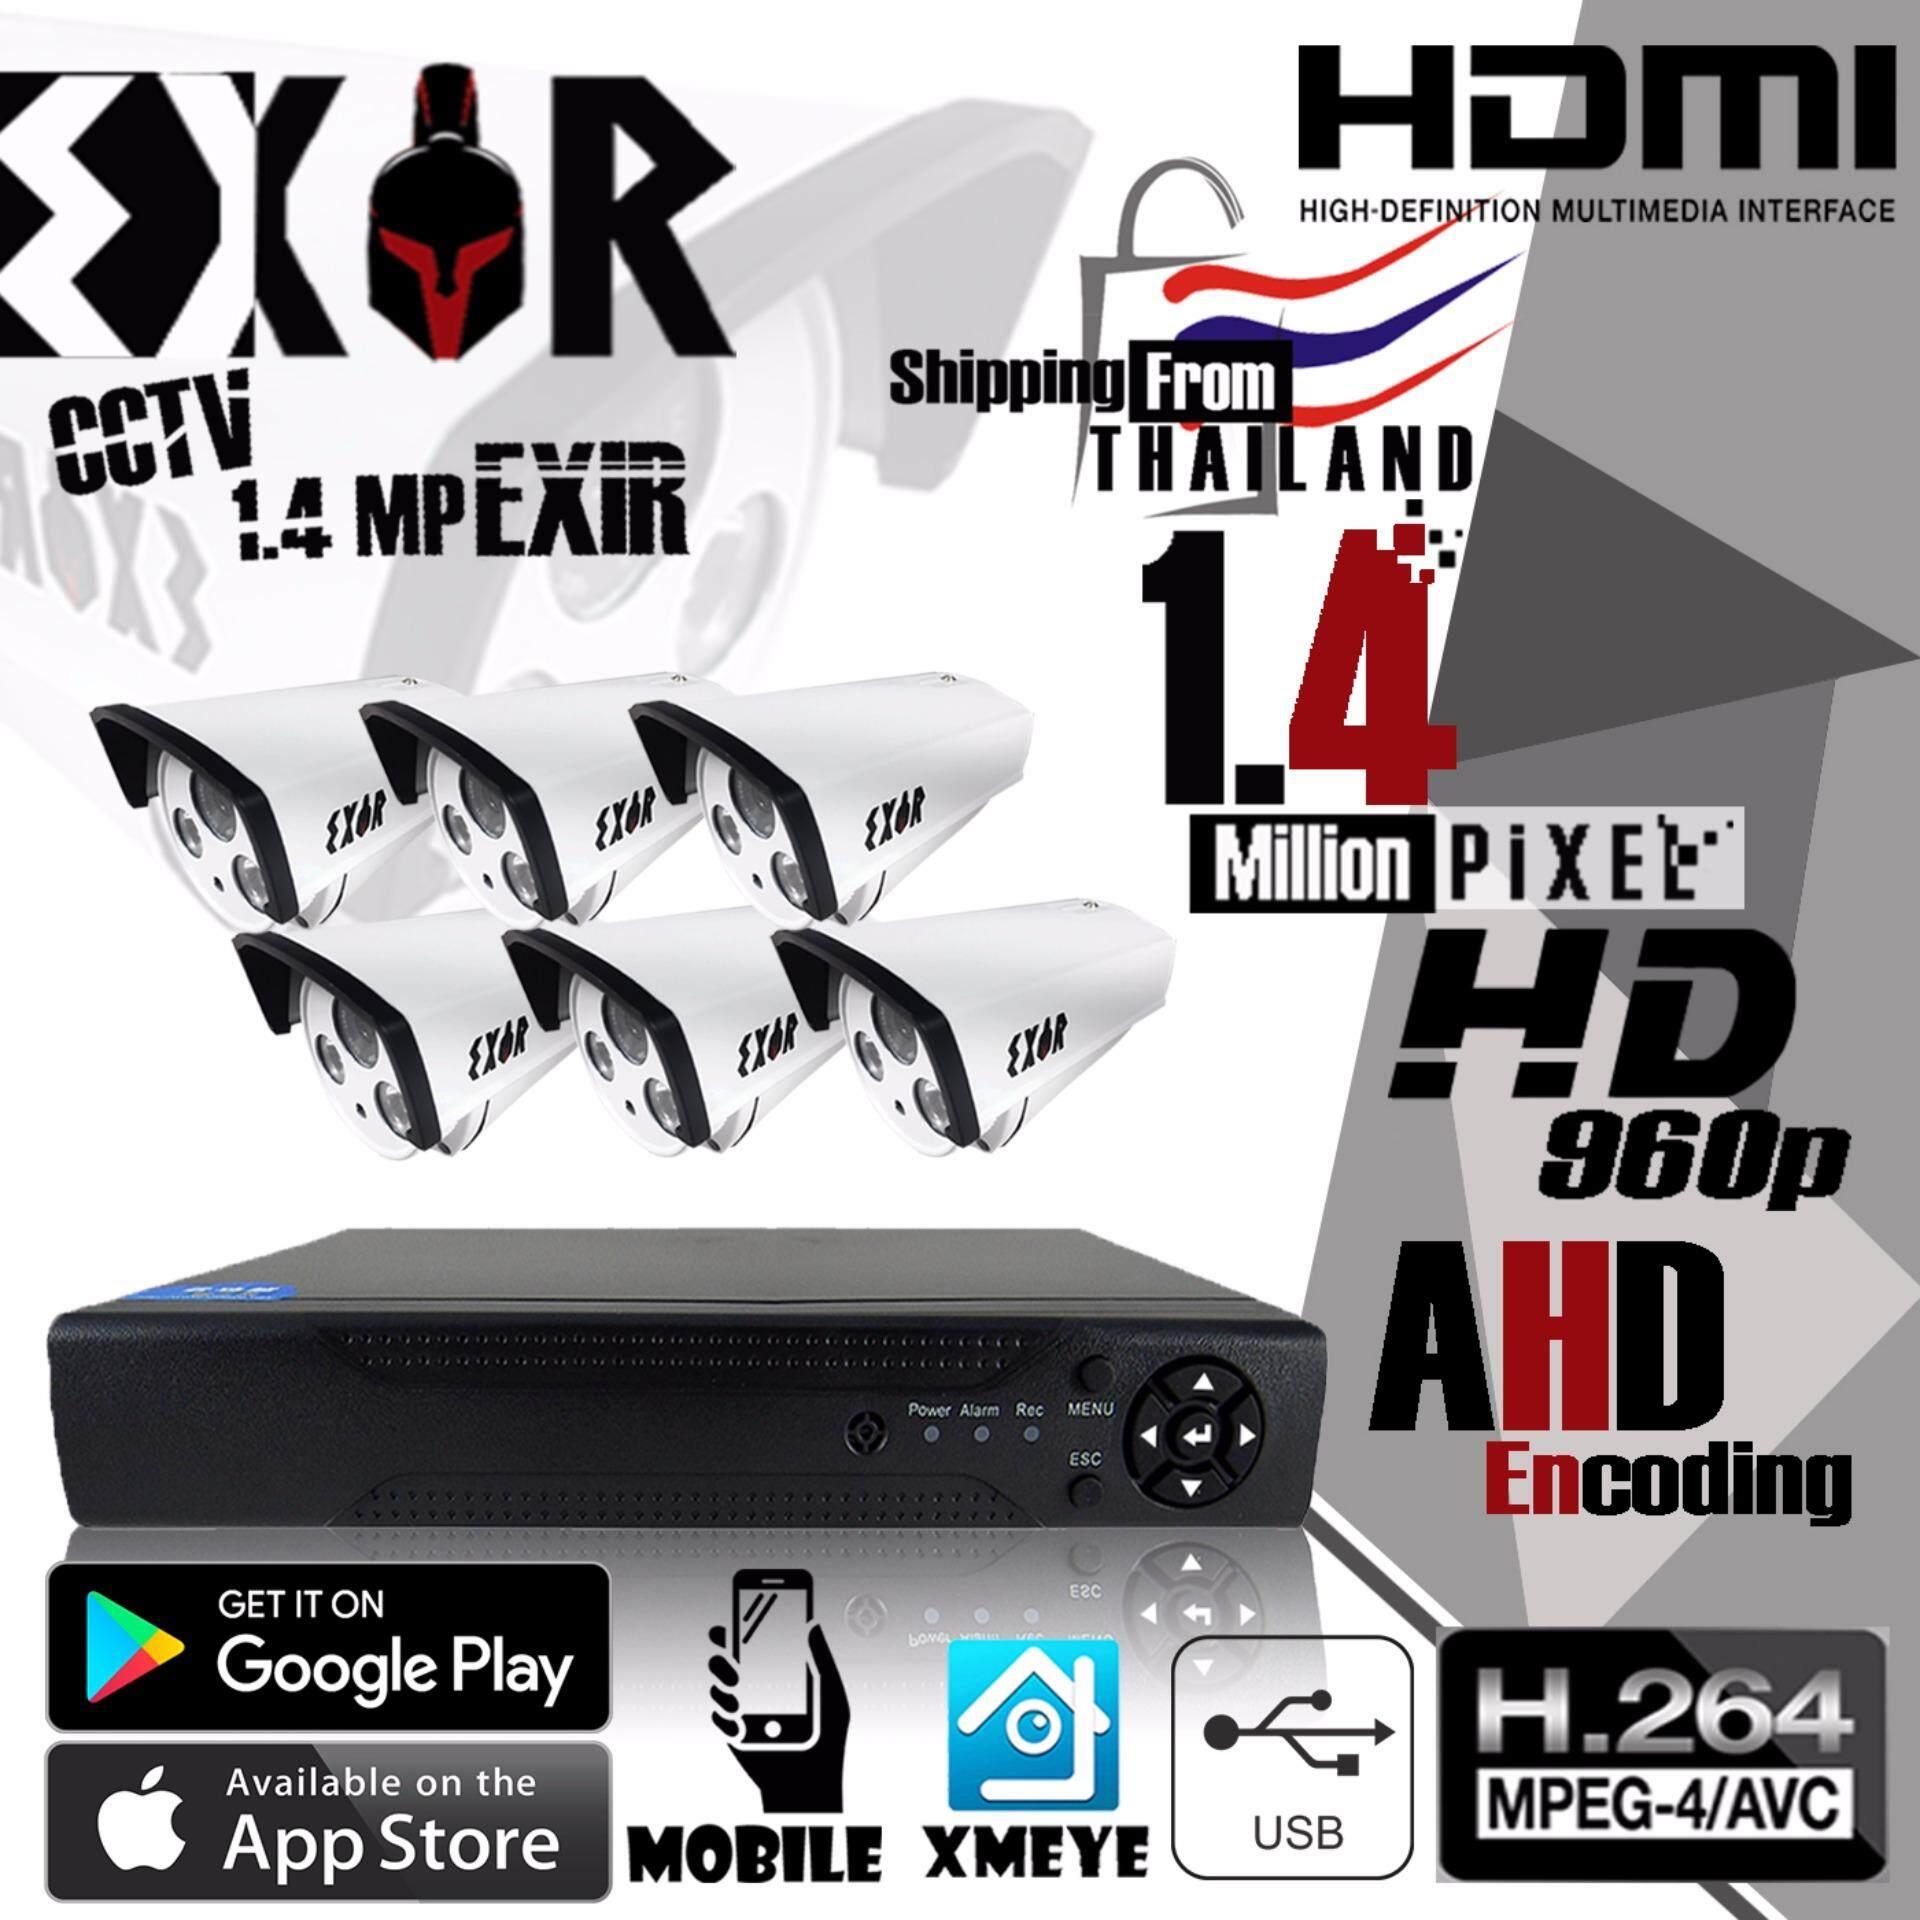 check ราคา ชุดกล้องวงจรปิด 1.4 MP ล้านพิกเซล ทรงกระบอก HD 960P เลนส์ 4mm กล้อง 6 ตัว และ เครื่องบันทึกภาพ 8CH DVR Digital Video Recording HD/Full HD / Waterproof ฟรีอะแดปเตอร์ และขายึดกล้อง ลดล้างสต๊อก